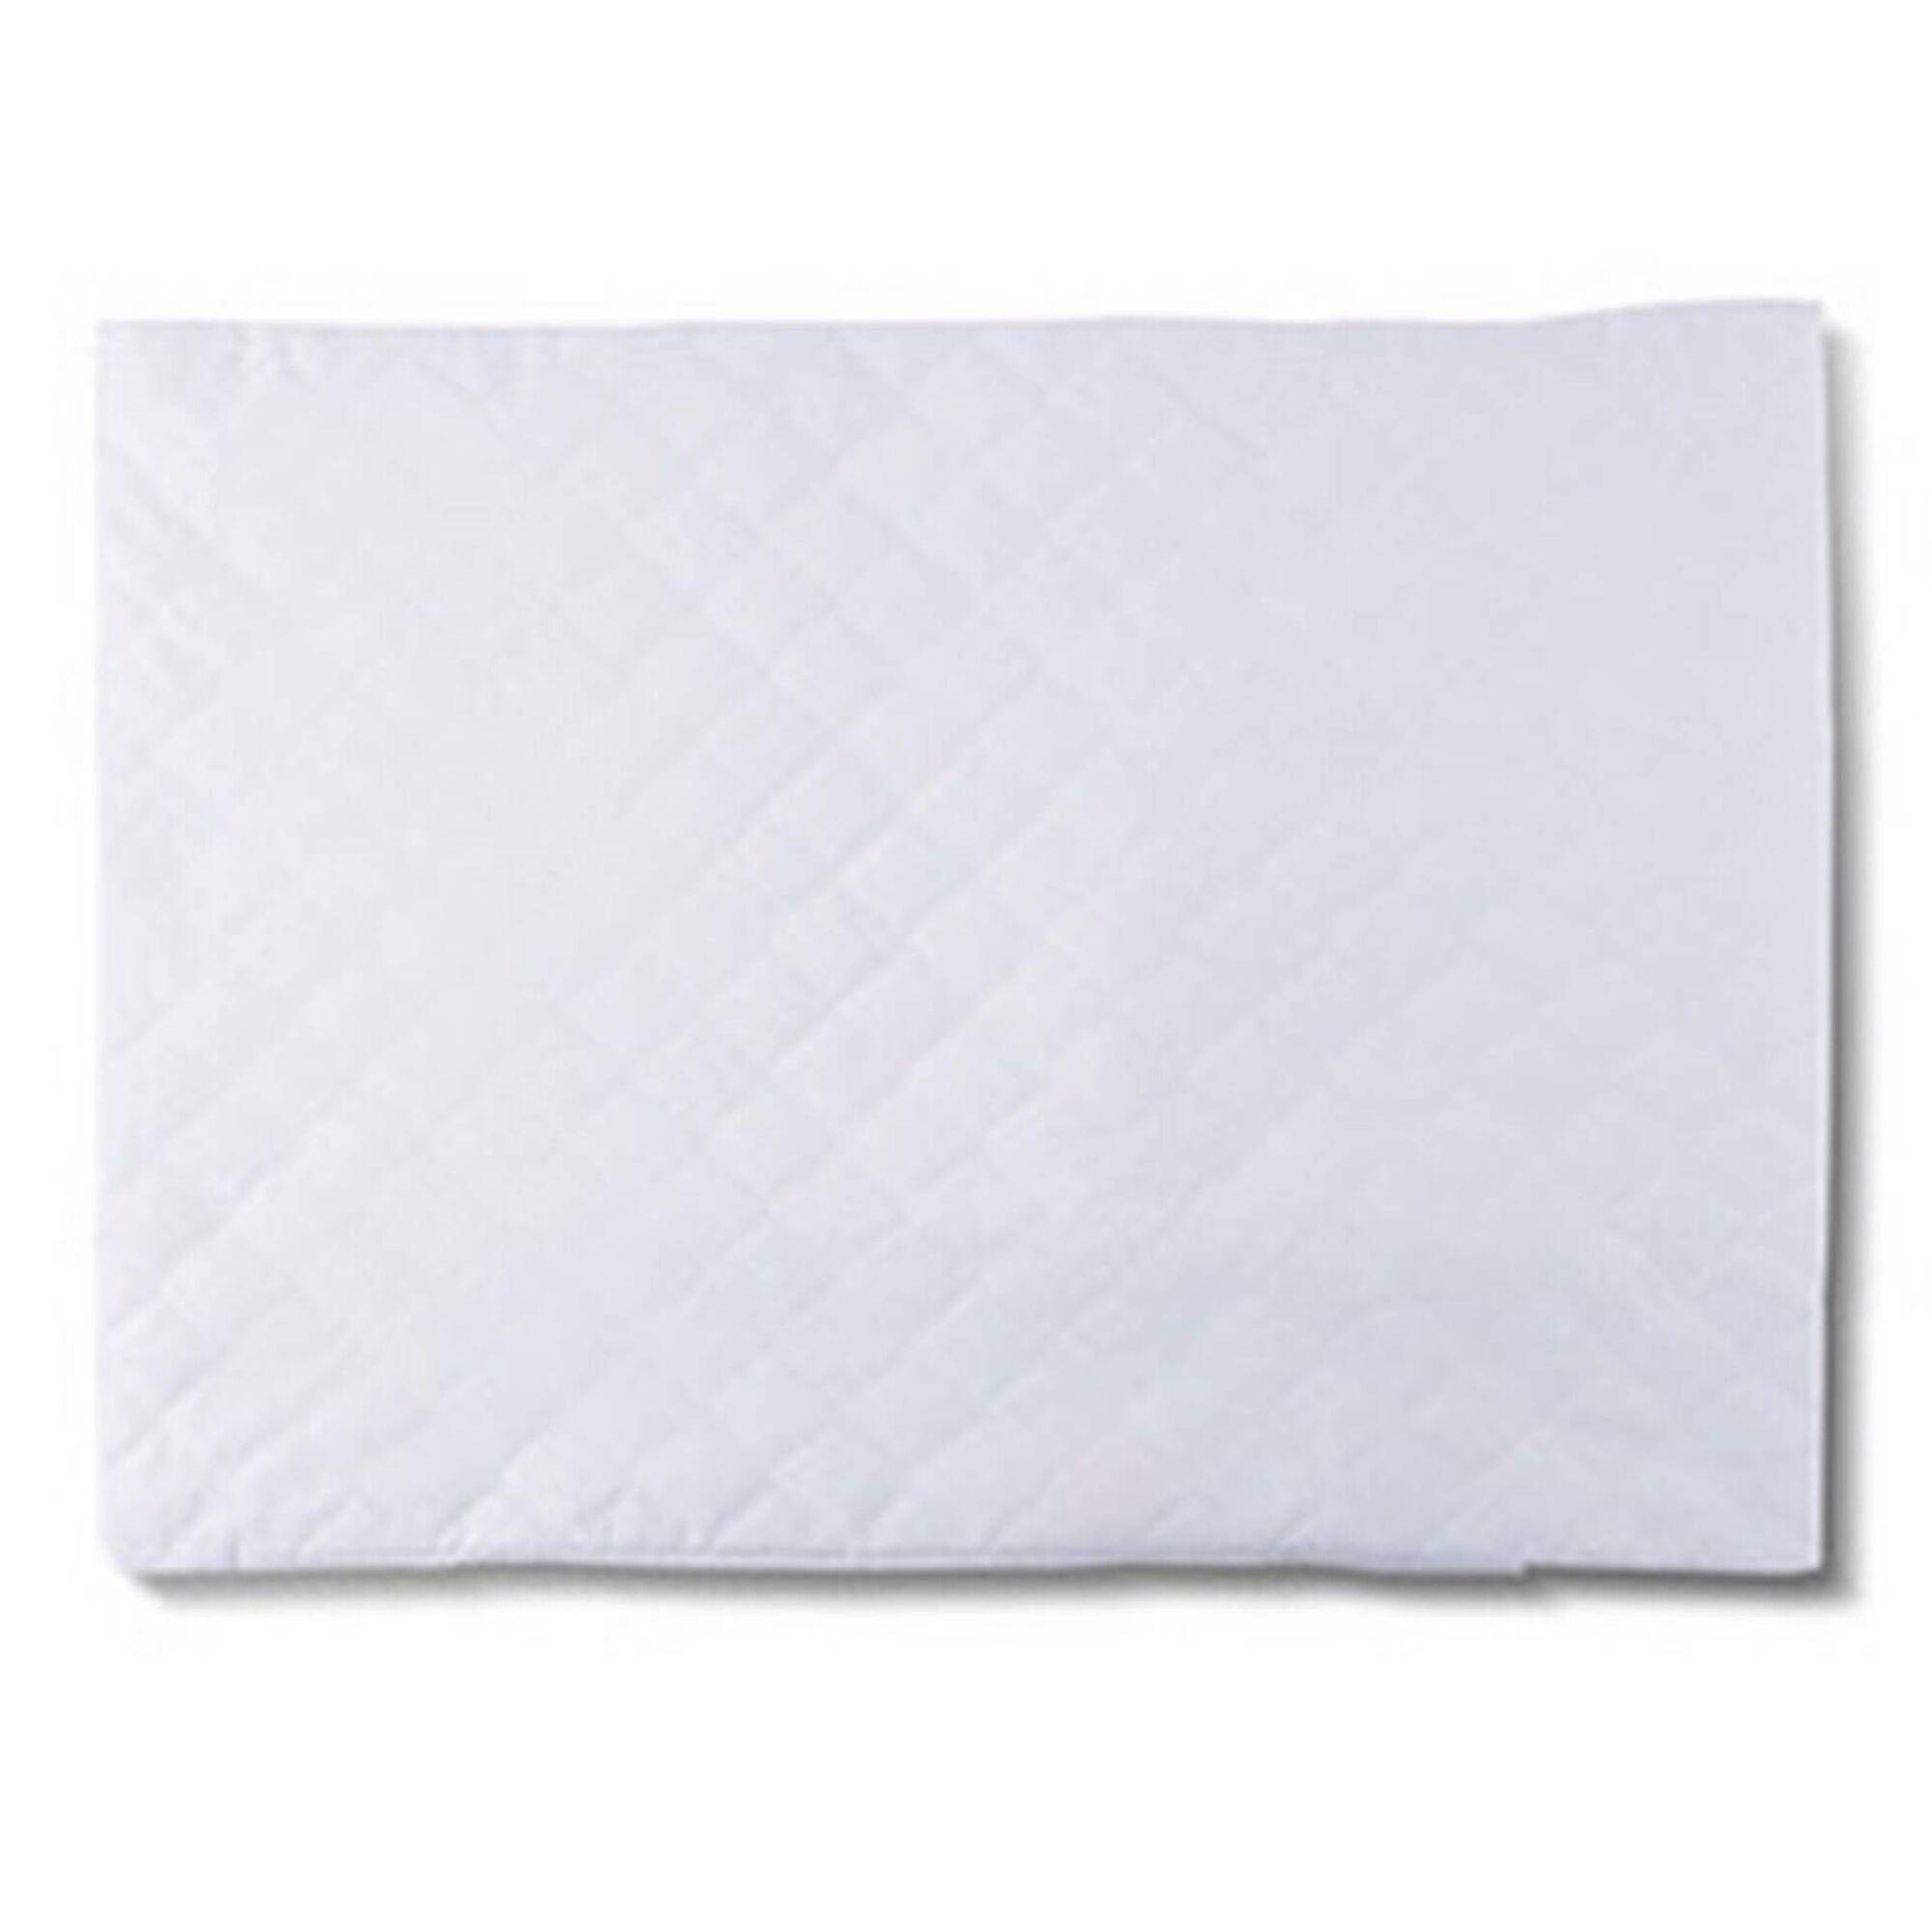 Protetor Almofada Acolchoado 45x60cm Branco